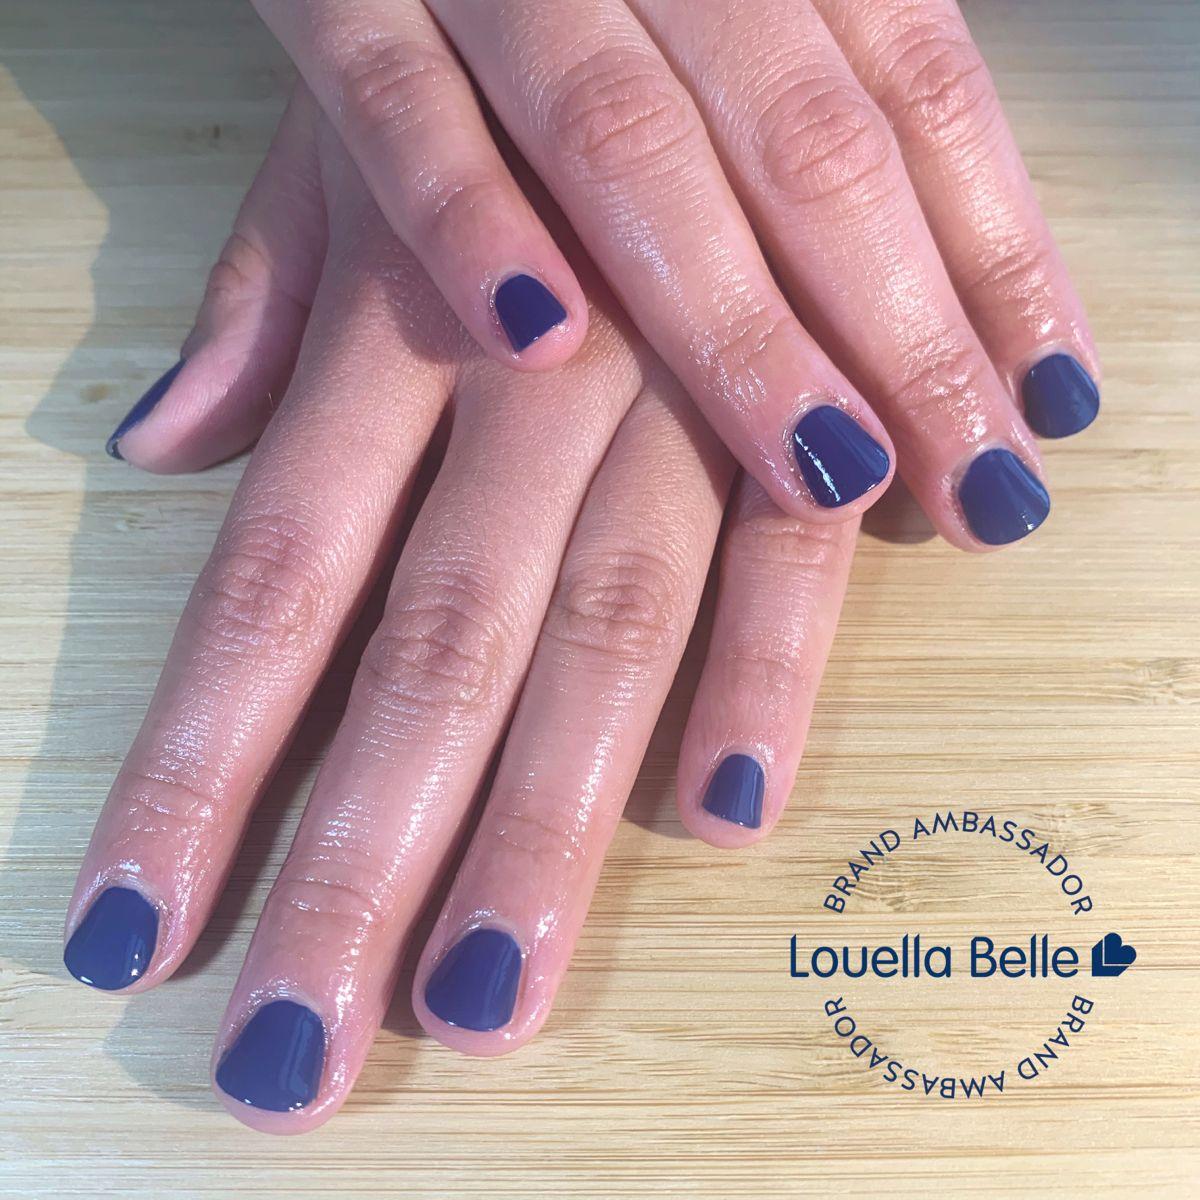 Midnight blue for @alicjsh over @famous_names @ibxnails treatment after a full gel removal 😊✨ #londonnails #bluenails #ibxtreatment #nails #dadioil #louellabelle #lbambassador #healthynails #shortnails #iloveshortnails #ibx #nailsofinstagram #regularpolishmanicure #manicure #boundsgreen #northlondonnails #treatwelluk #treatwellpartner